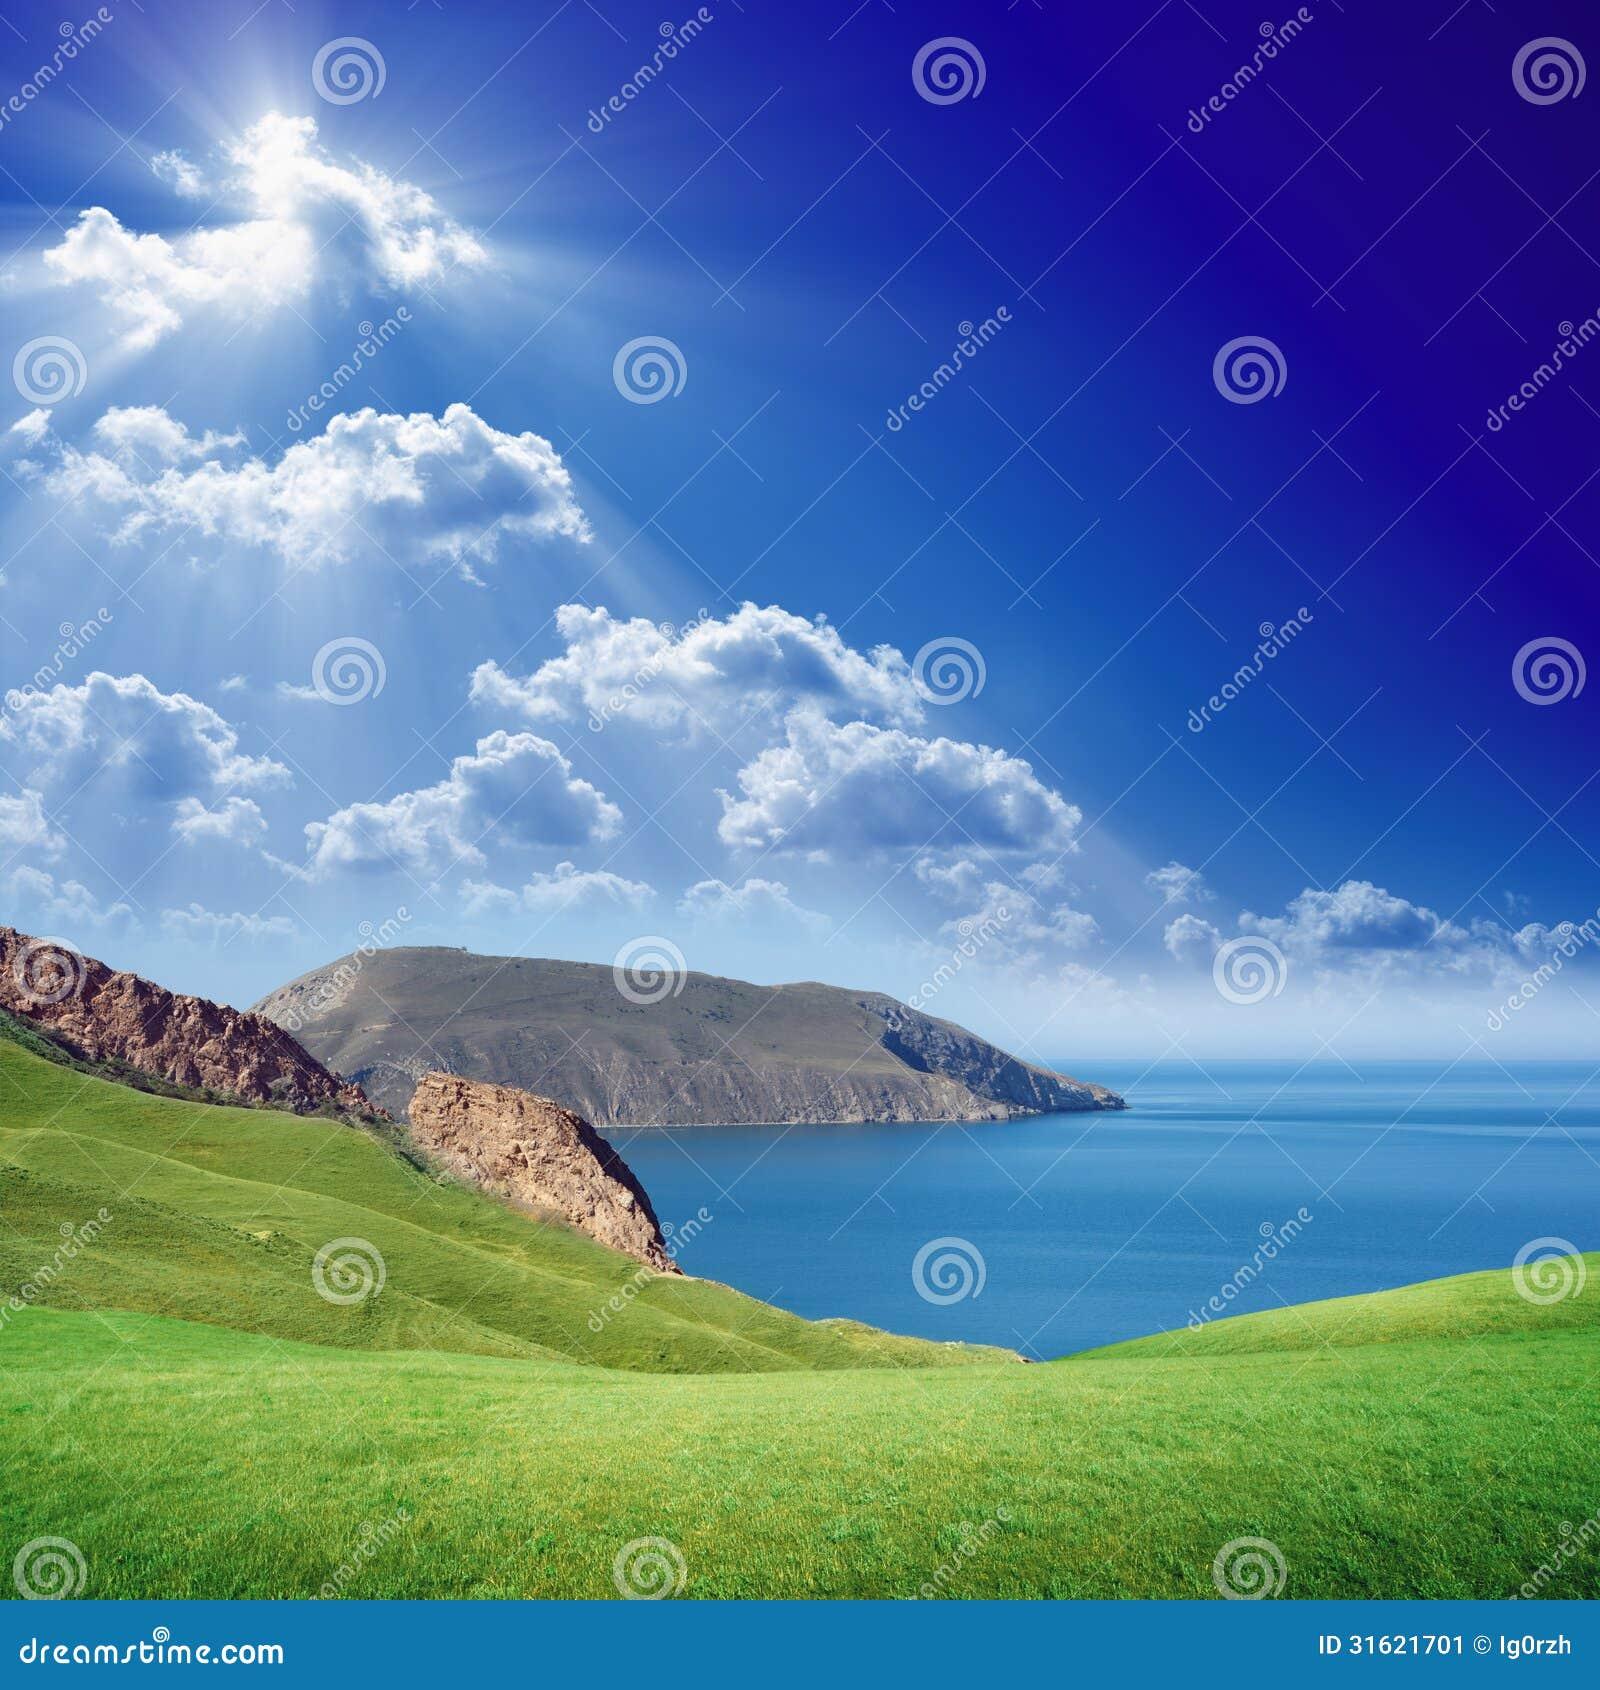 Web Design Blue Mountains